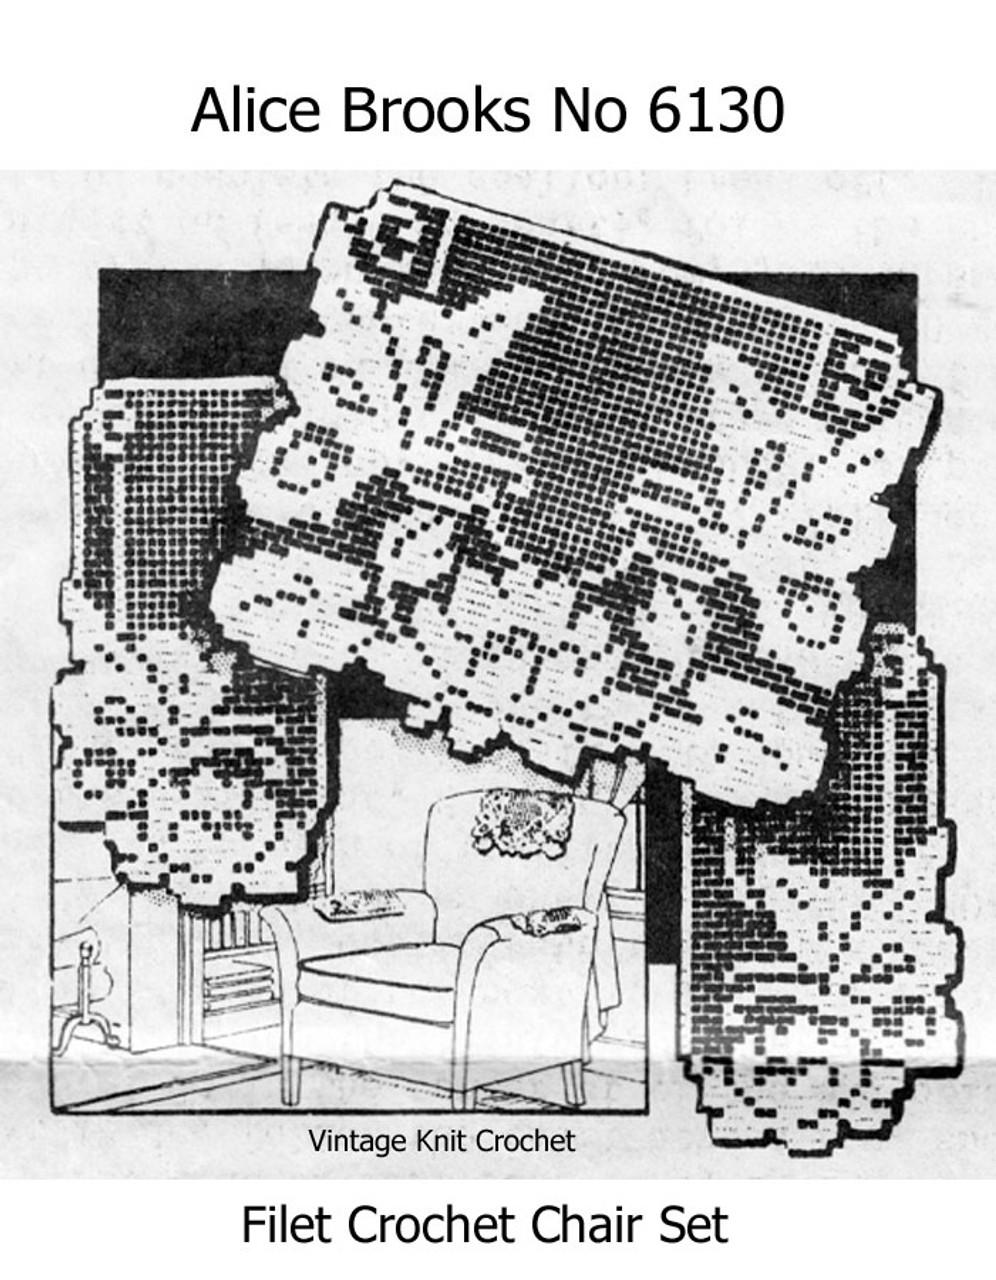 Butterfly Filet Crochet Chair Doily Pattern Set No 6130